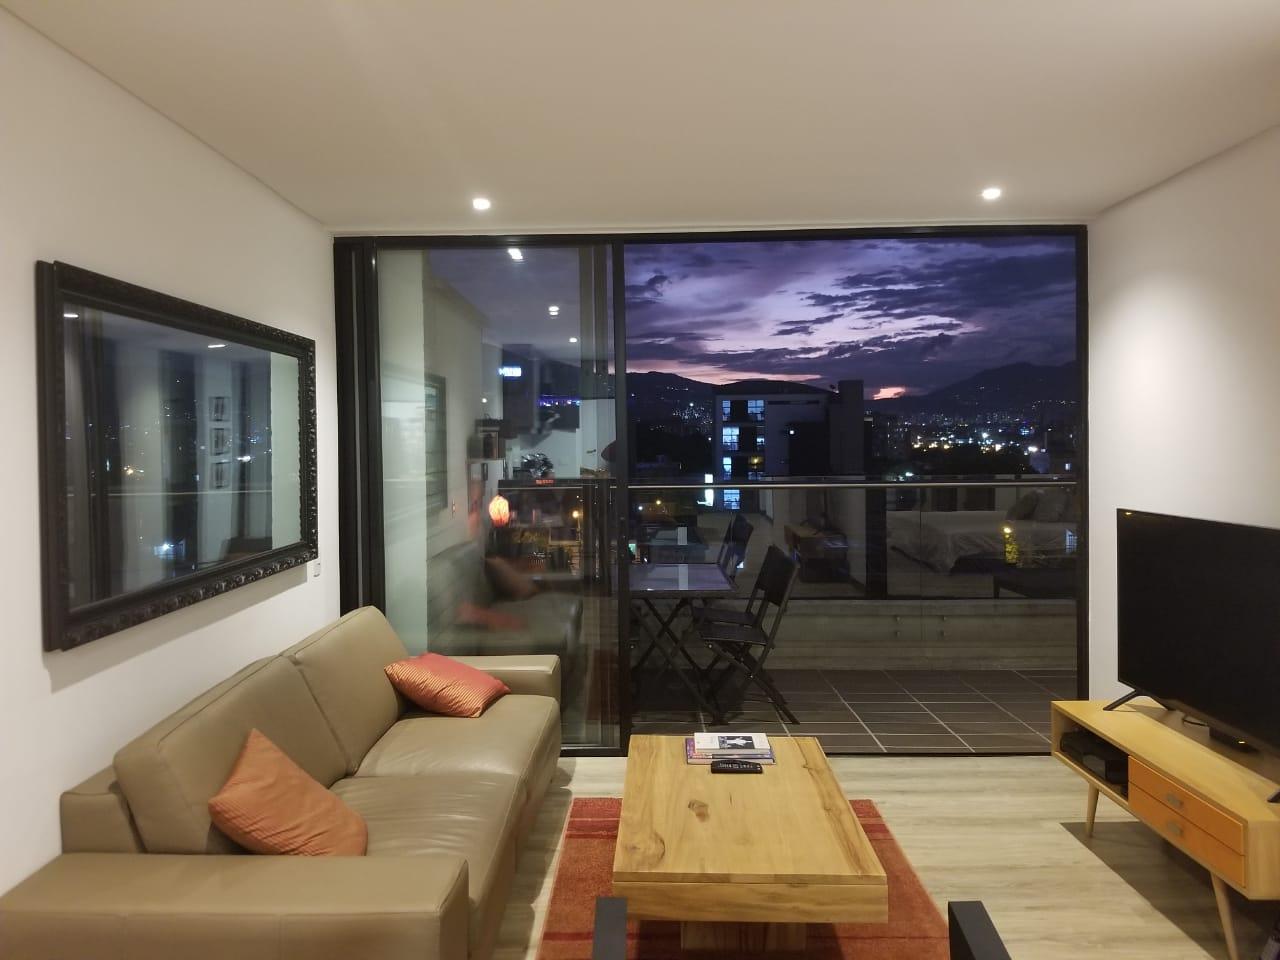 Manila Center – Beautiful Apartment in Trendy Neighborhood